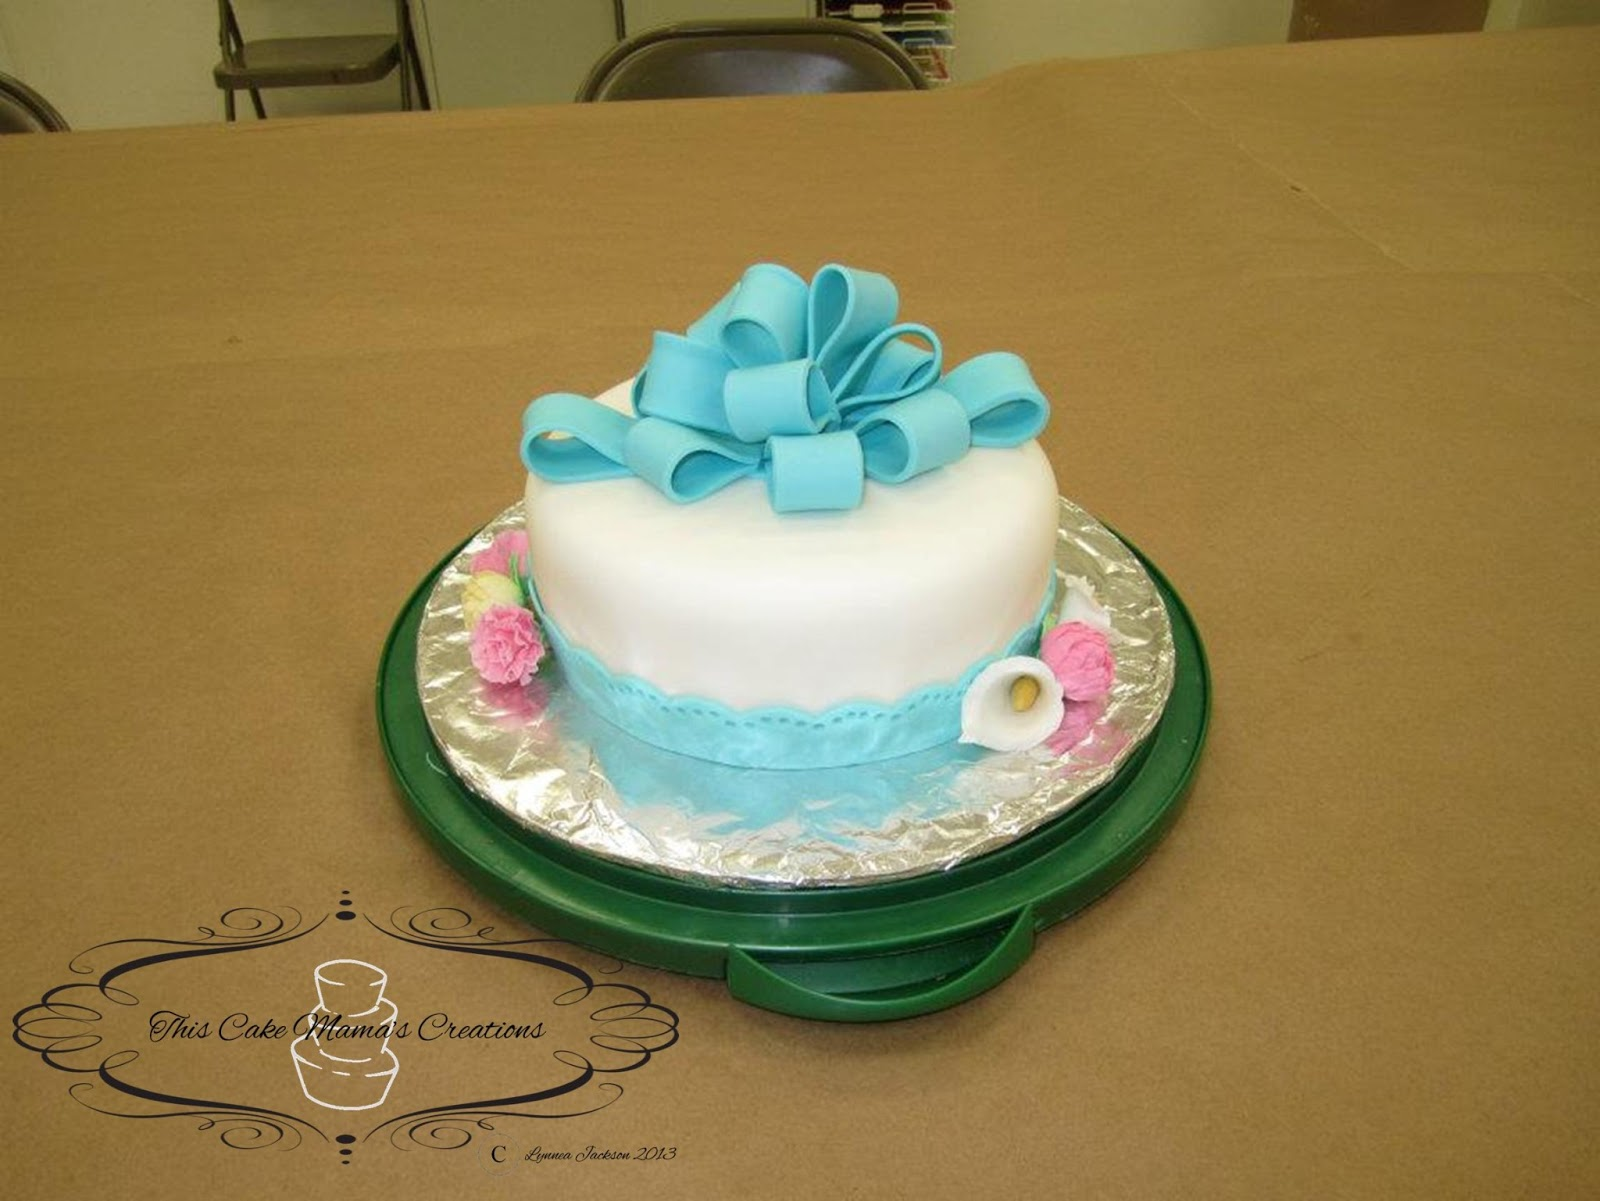 Cake With Fondant Flowers : Cake Mama s Creations: Fondant Flowers